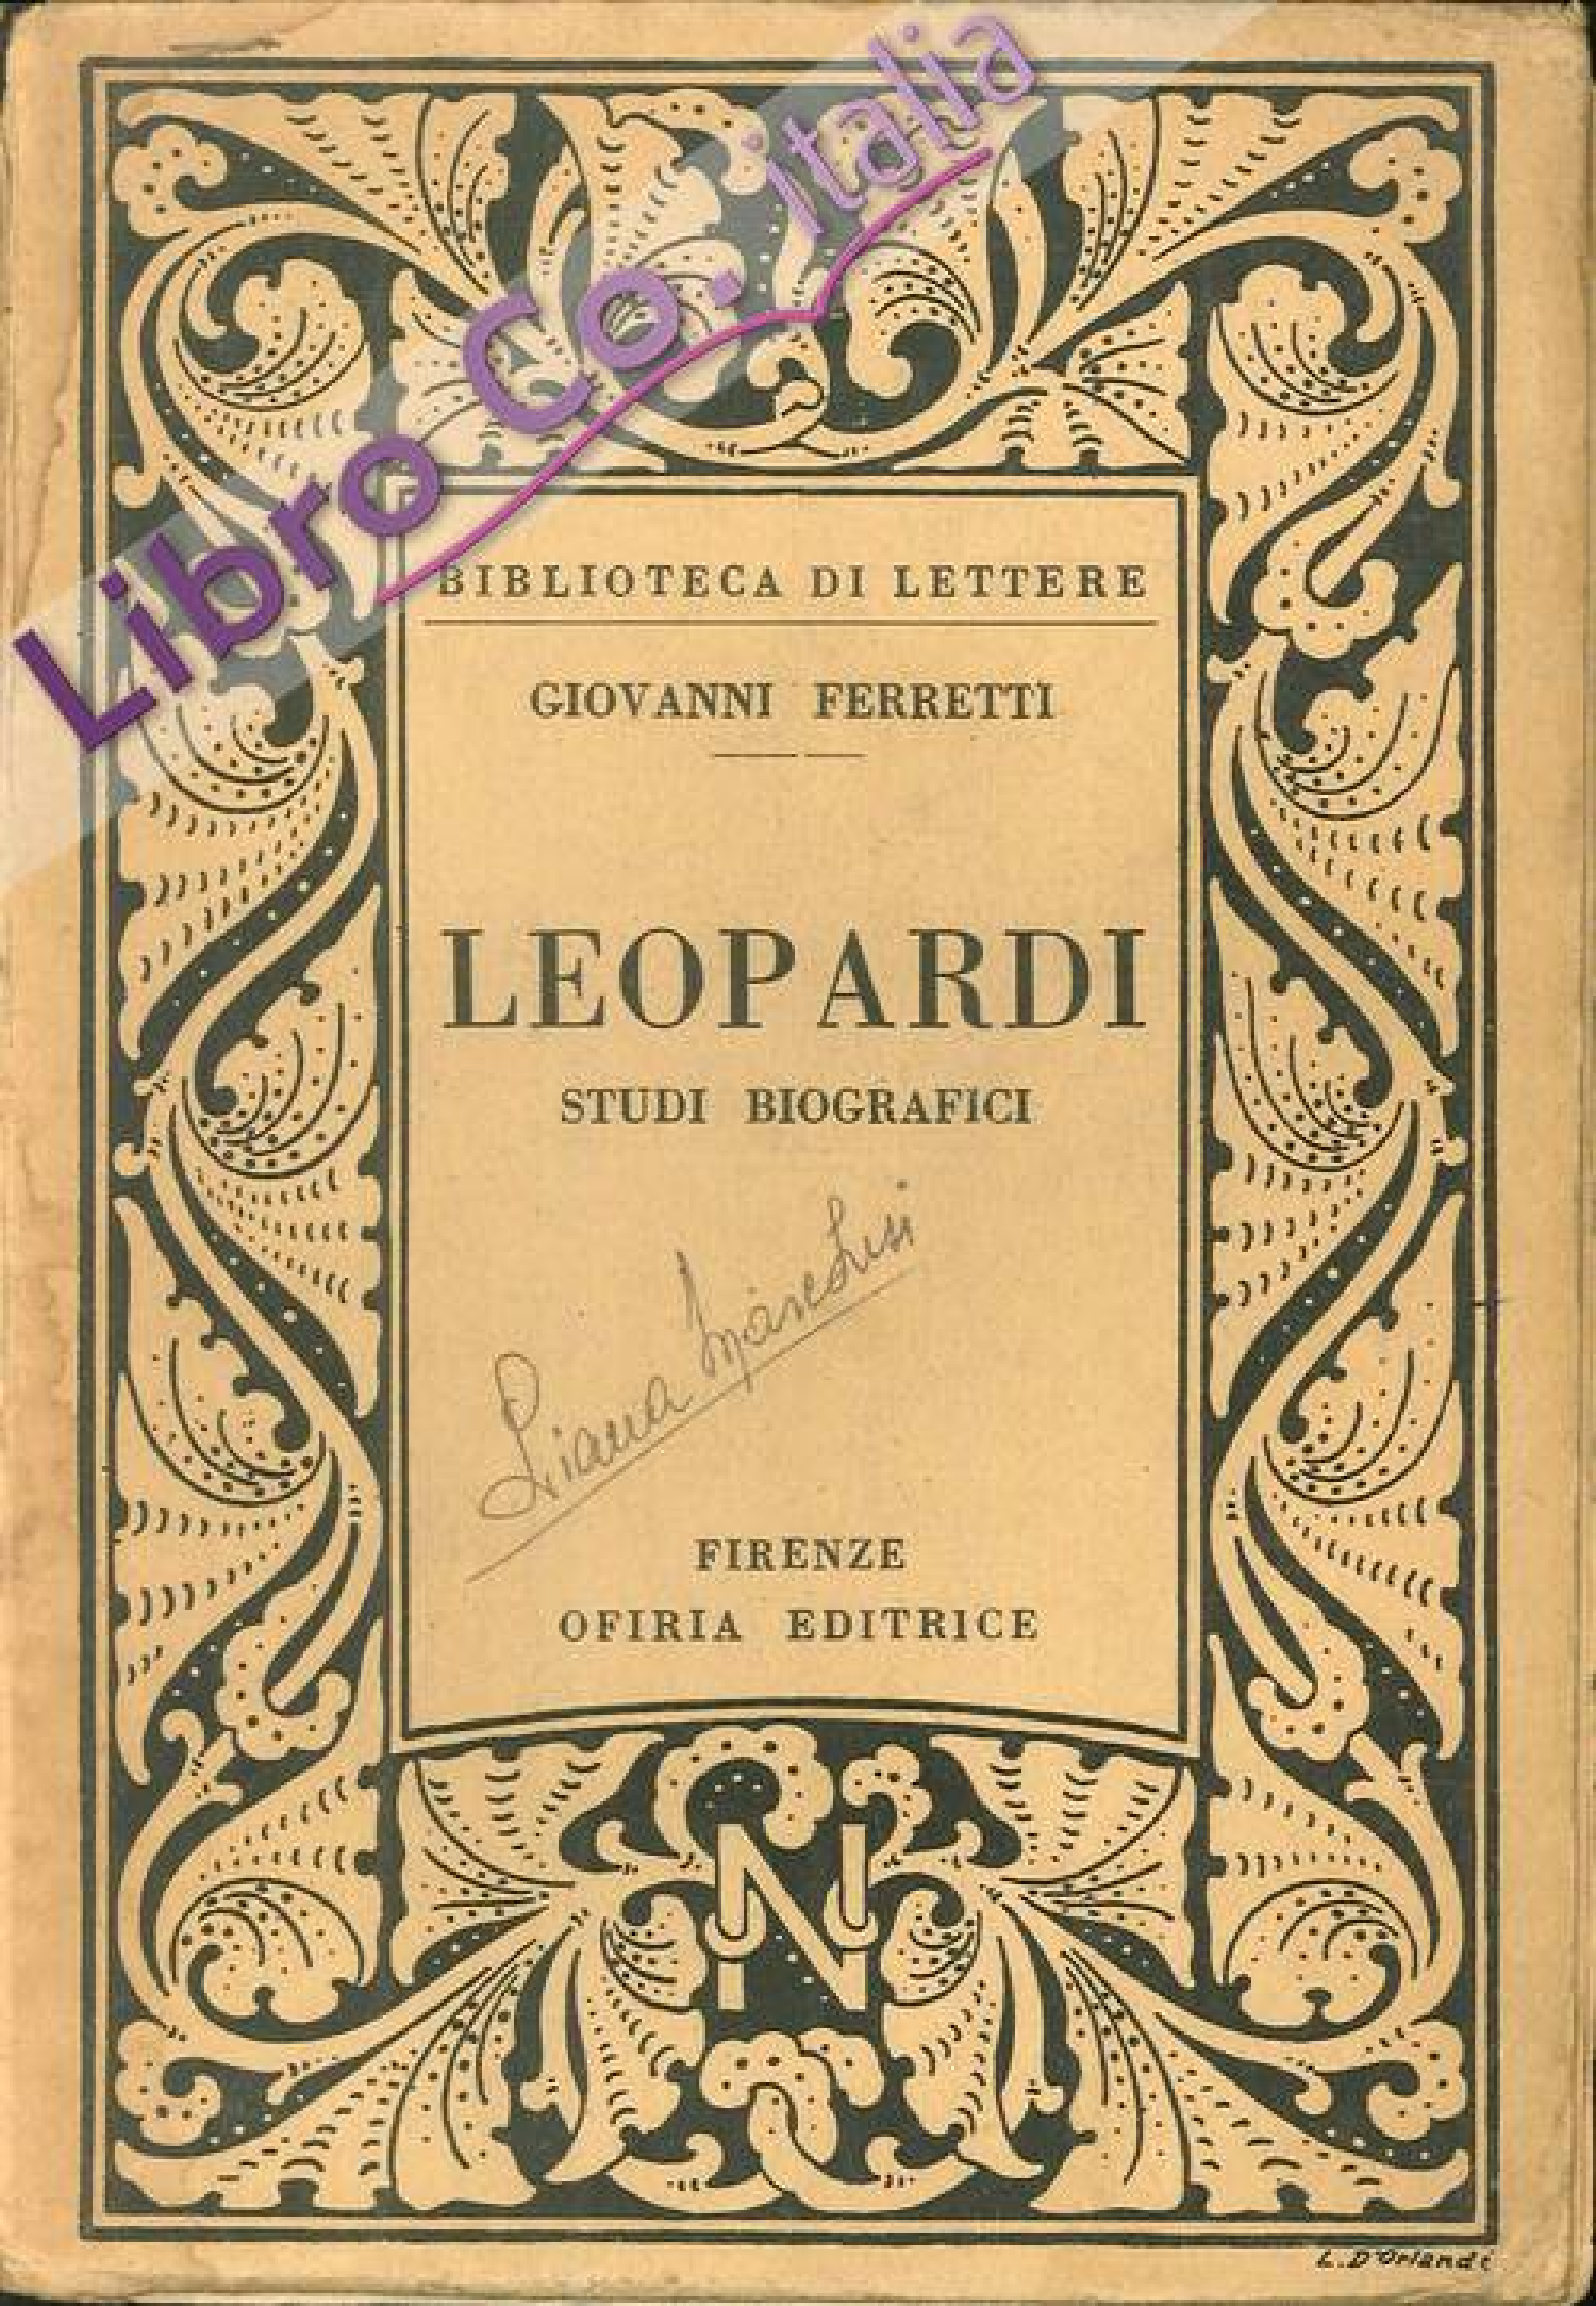 Leopardi. Studi biografici